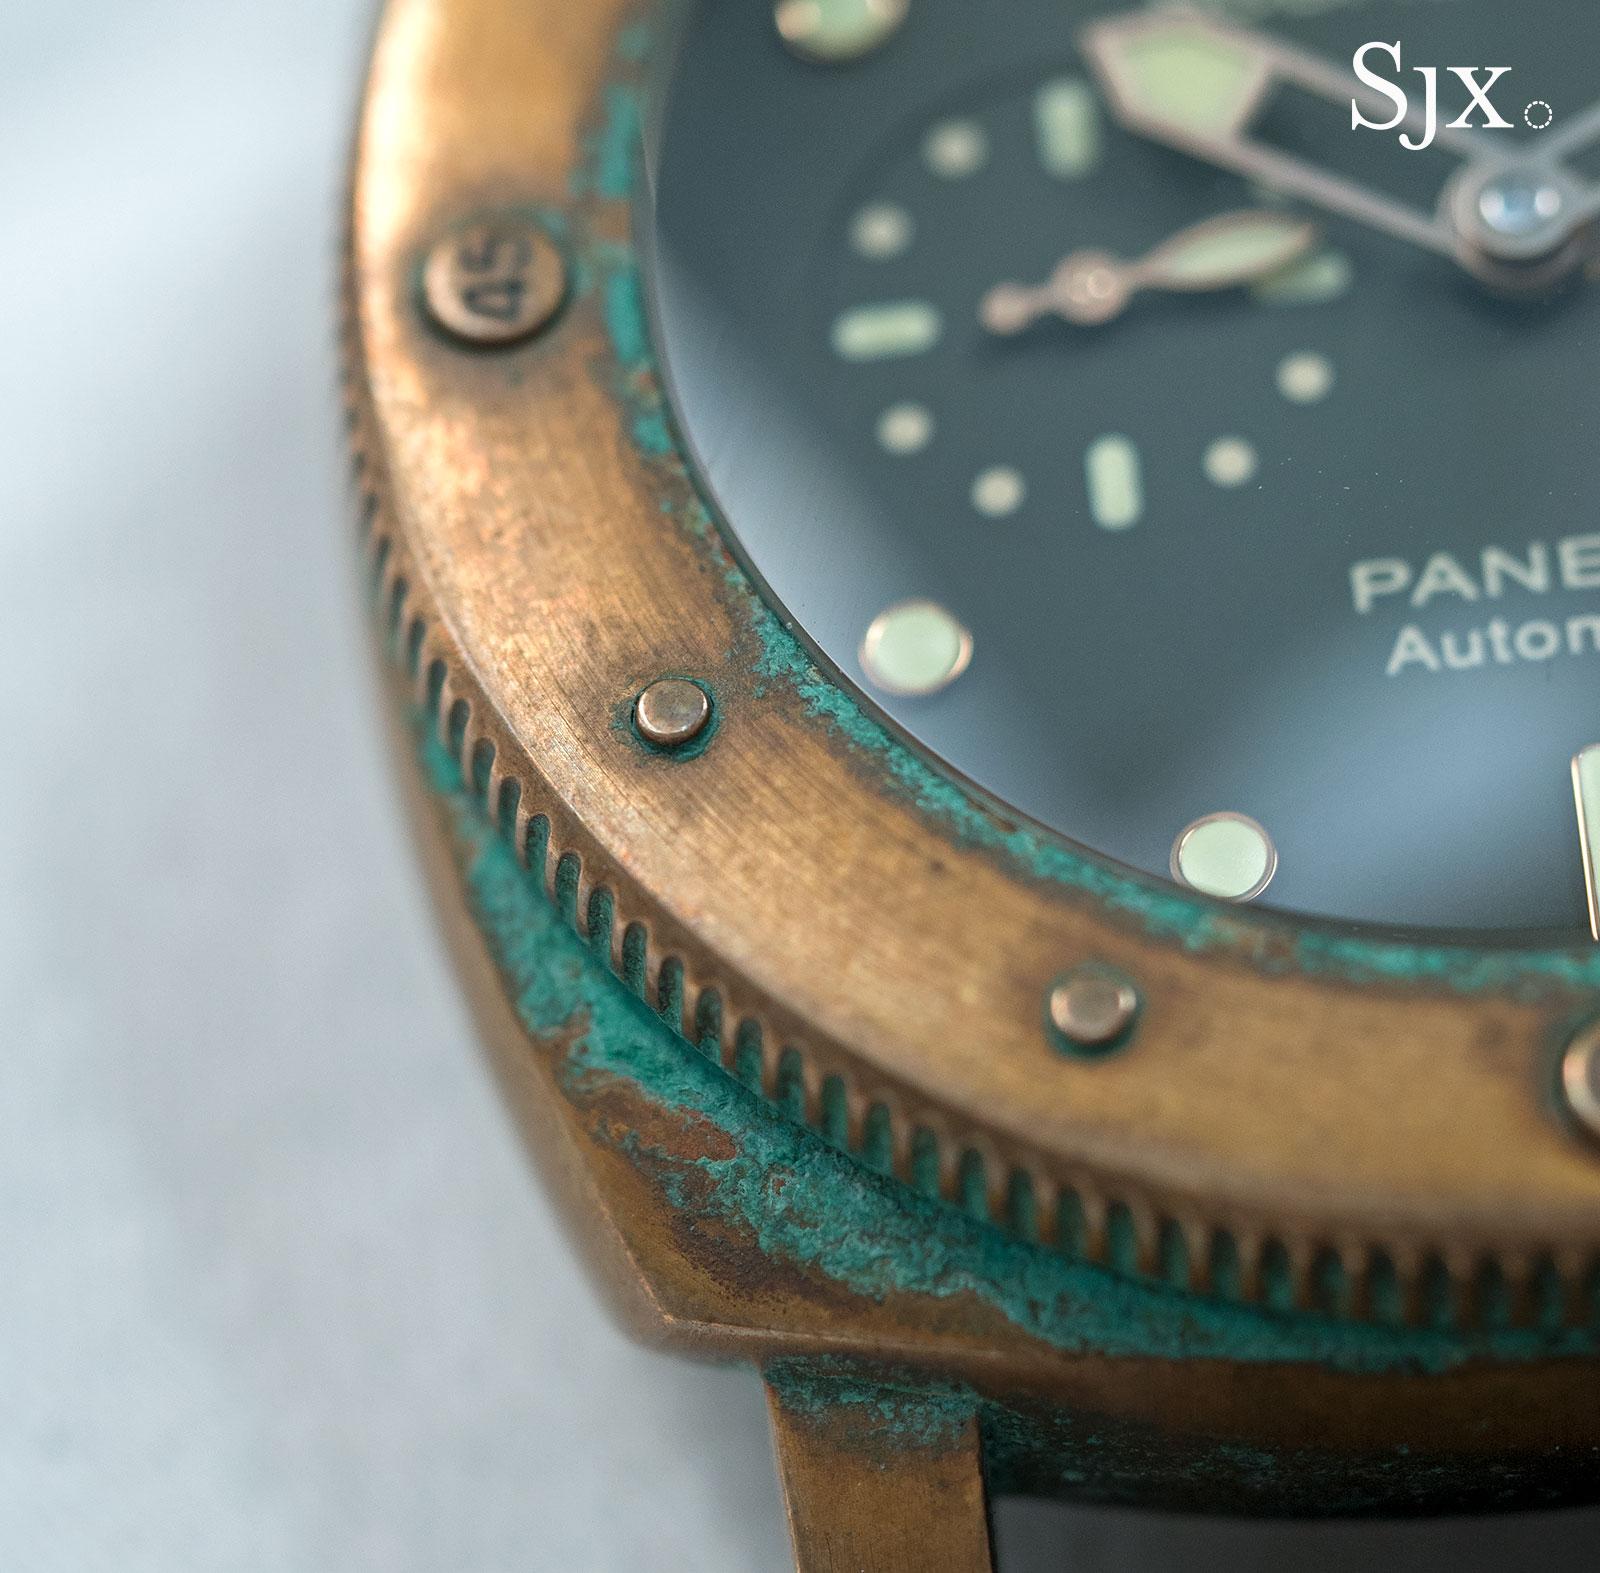 Panerai Bronzo PAM382 Picciotto Chronopassion 5